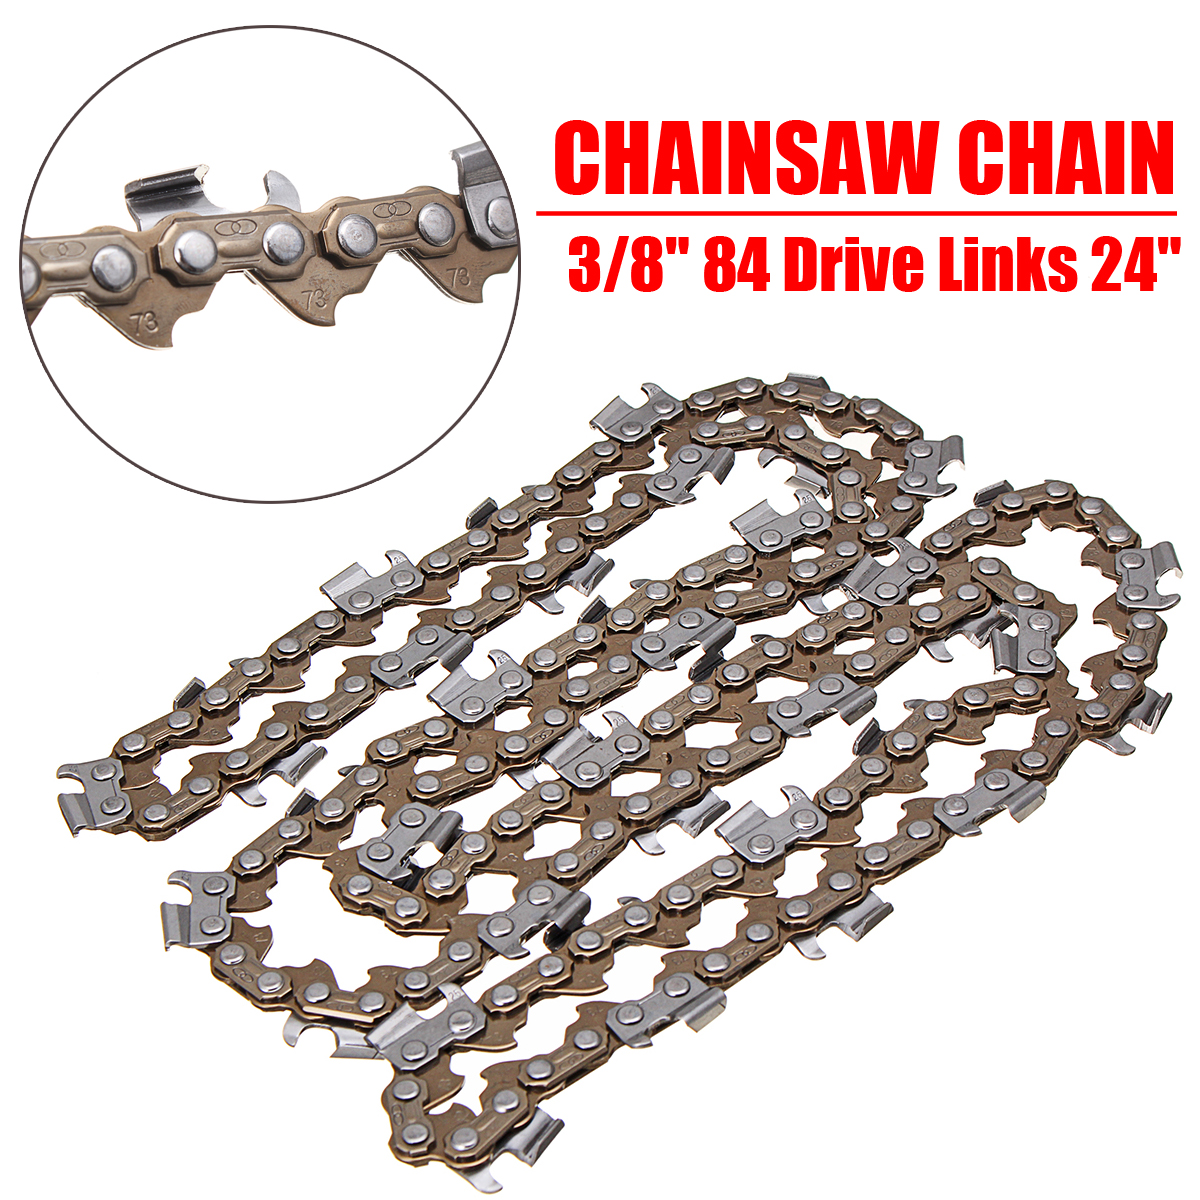 "050 BRAND NEW 12/"" CHAINSAW CHAIN FITS STIHL MS020 3//8 1.3MM"